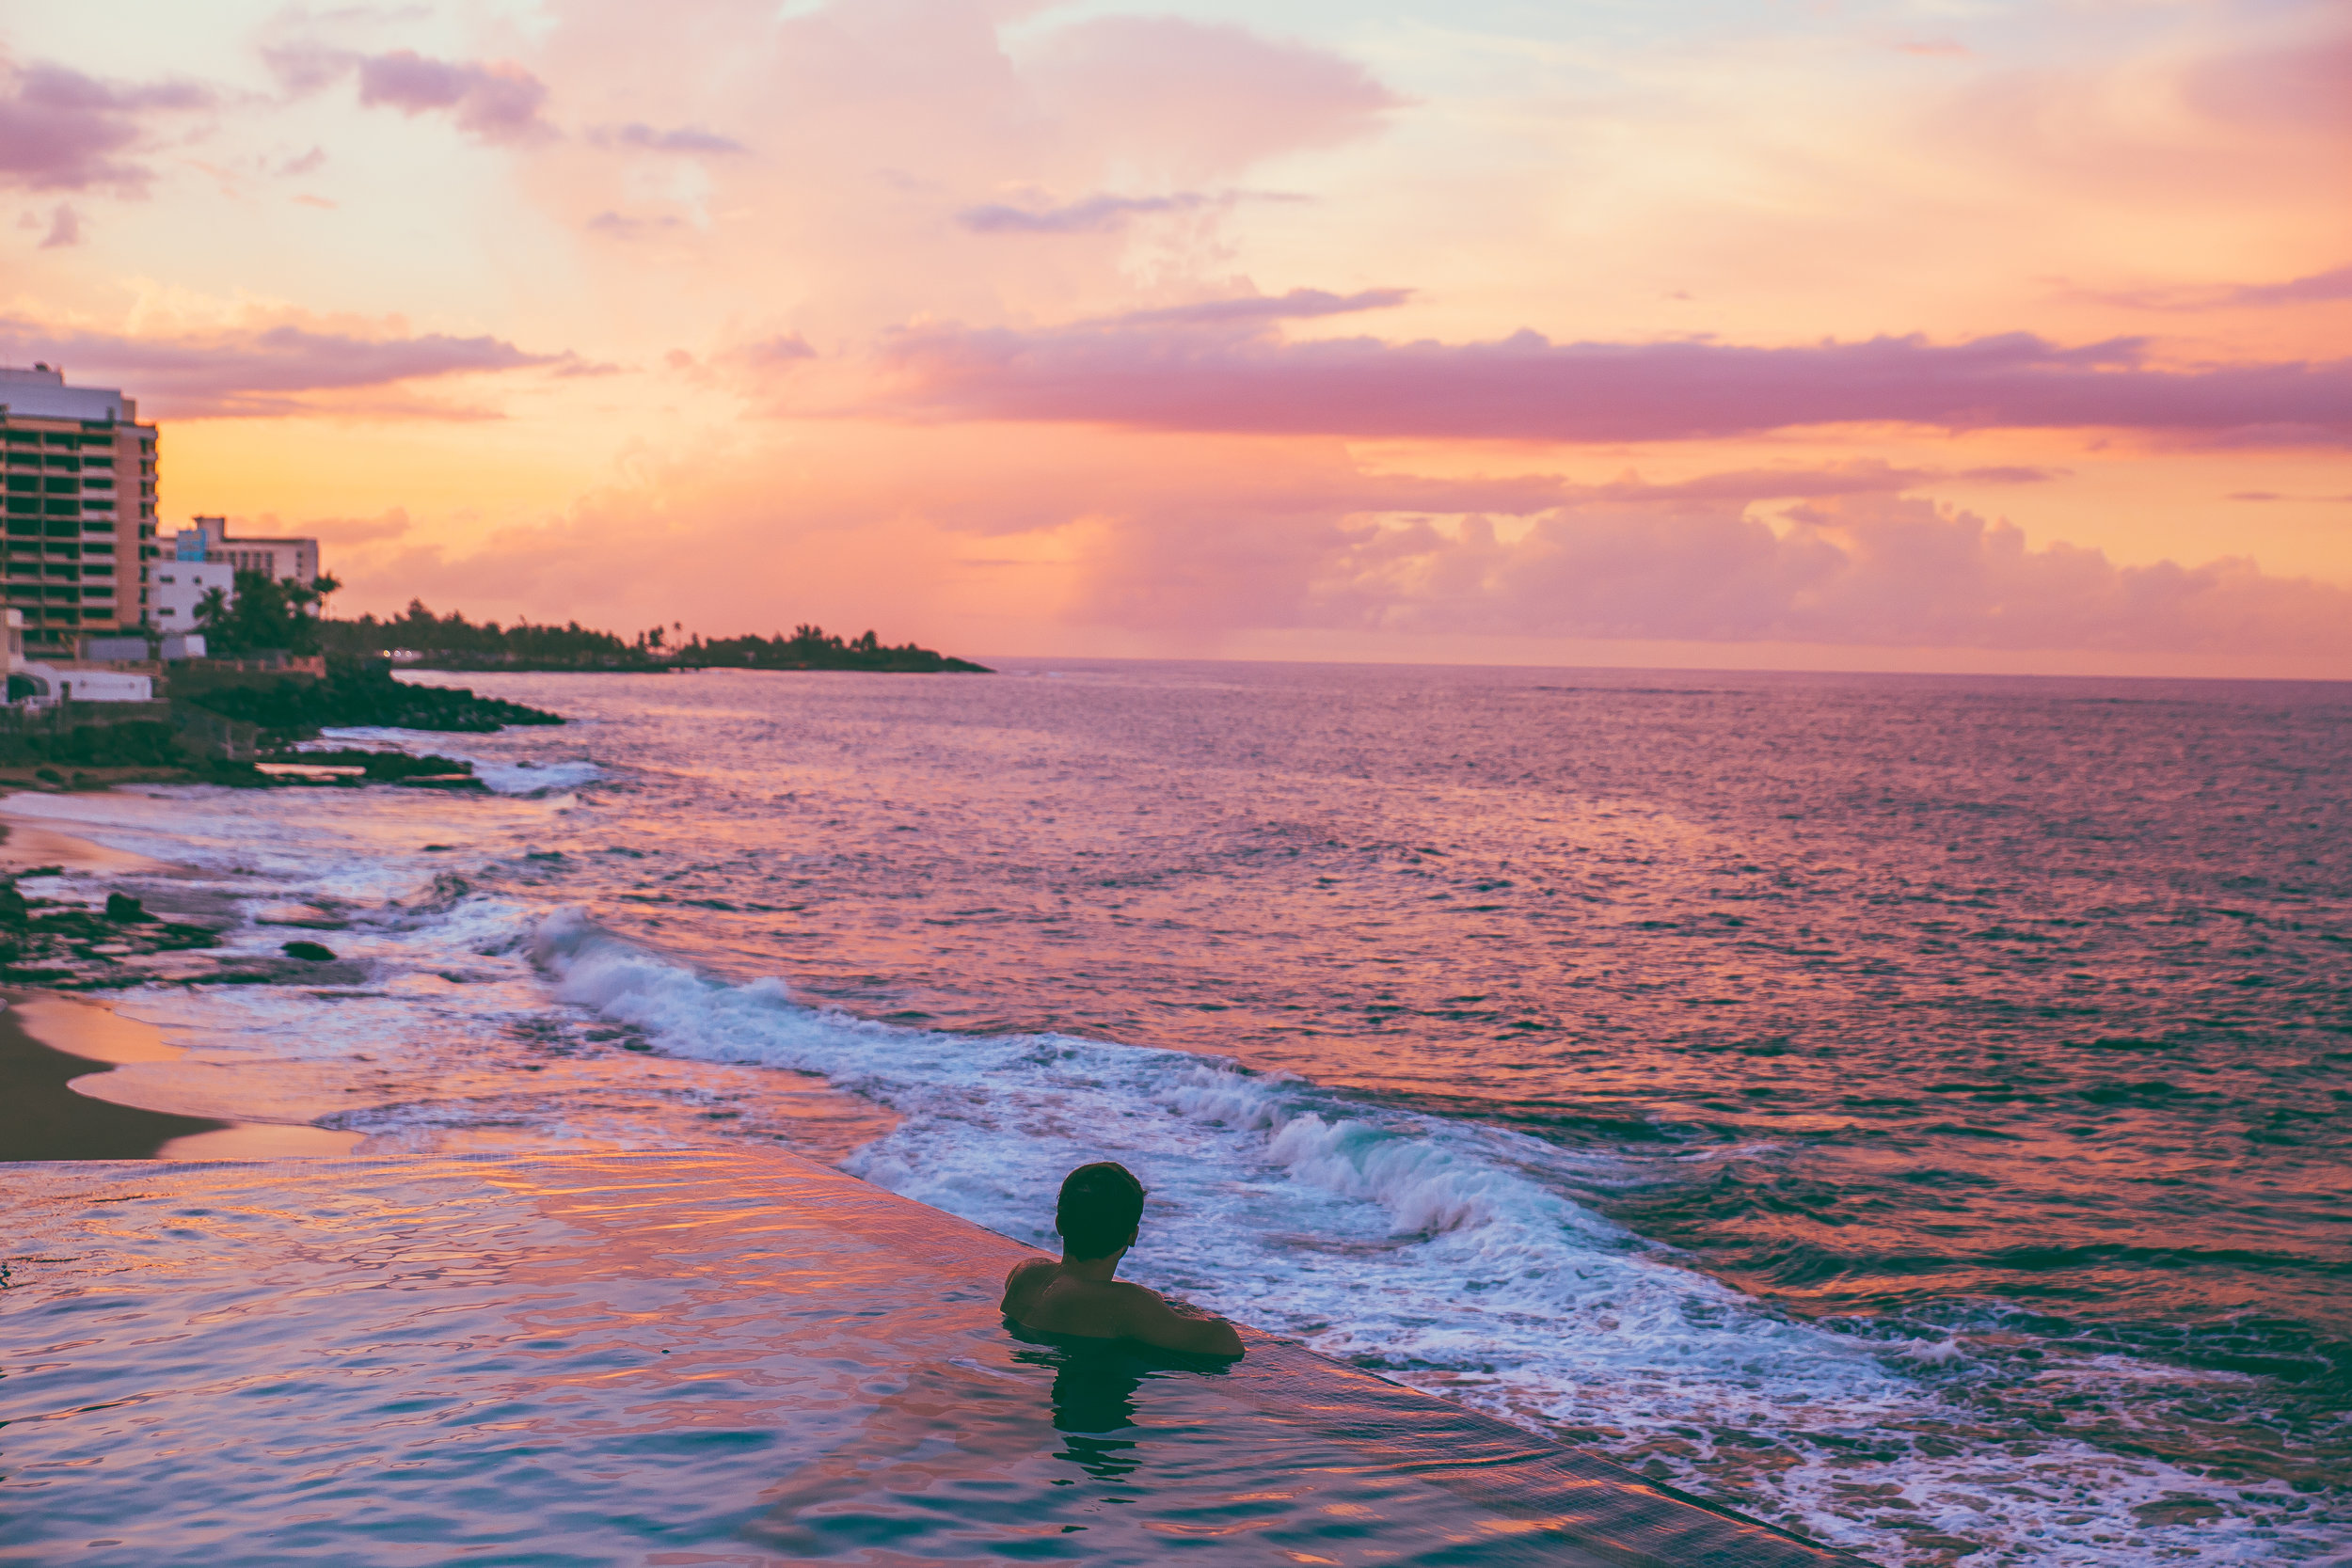 Checking In: Condado Vanderbilt Hotel (San Juan, Puerto Rico) // #readysetjetset #sanjuan #puertorico #luxuryhotels #hotels #beach #sunset www.readysetjetset.net